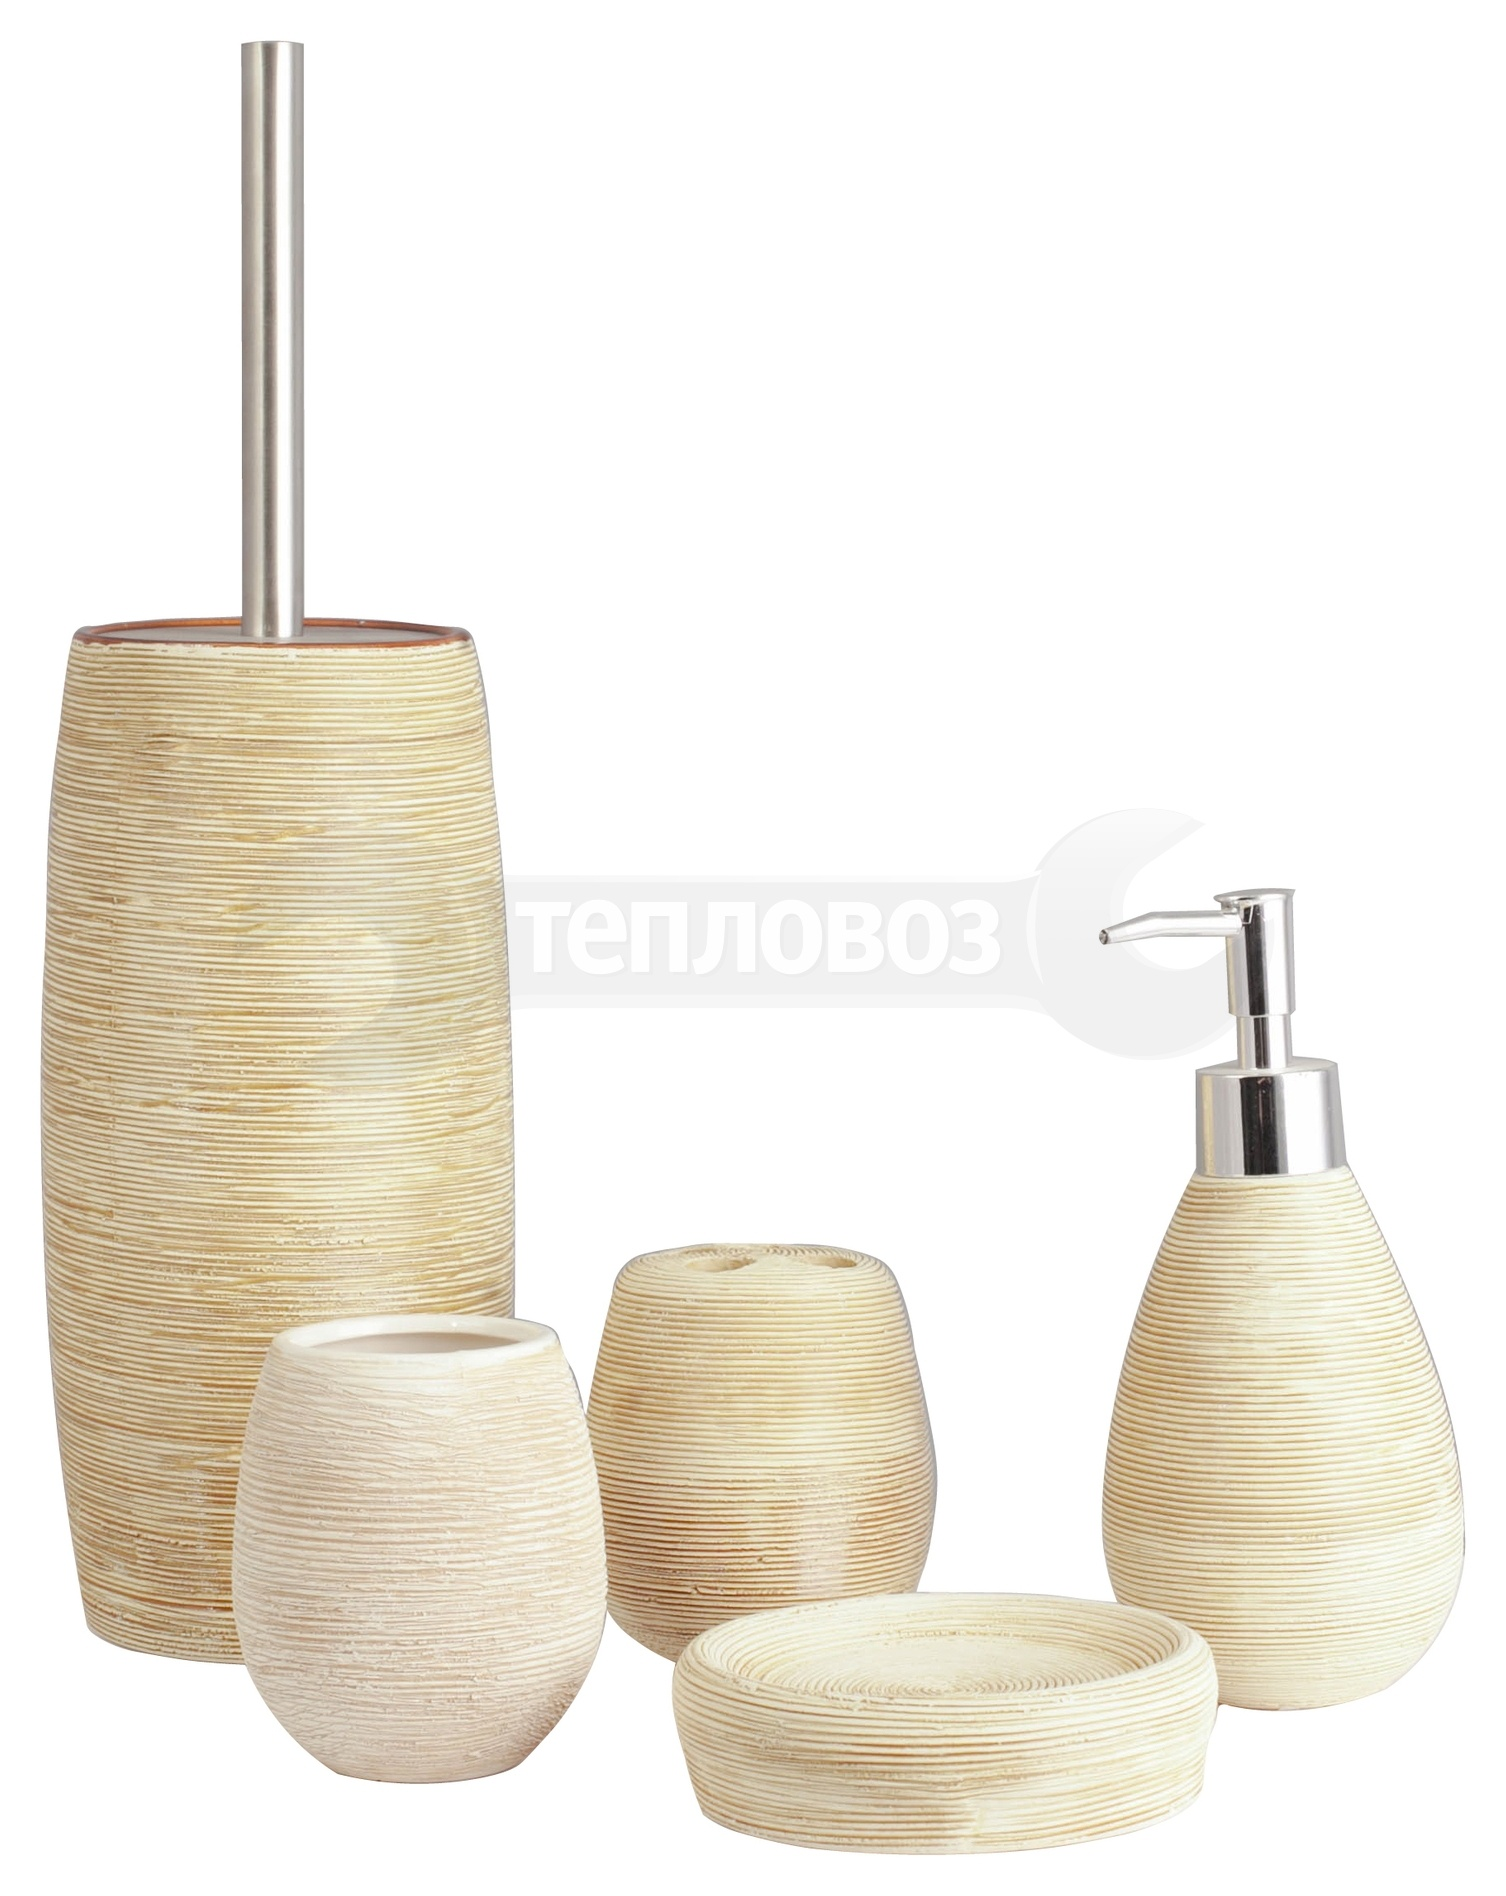 Duschy Beees Light 351-01